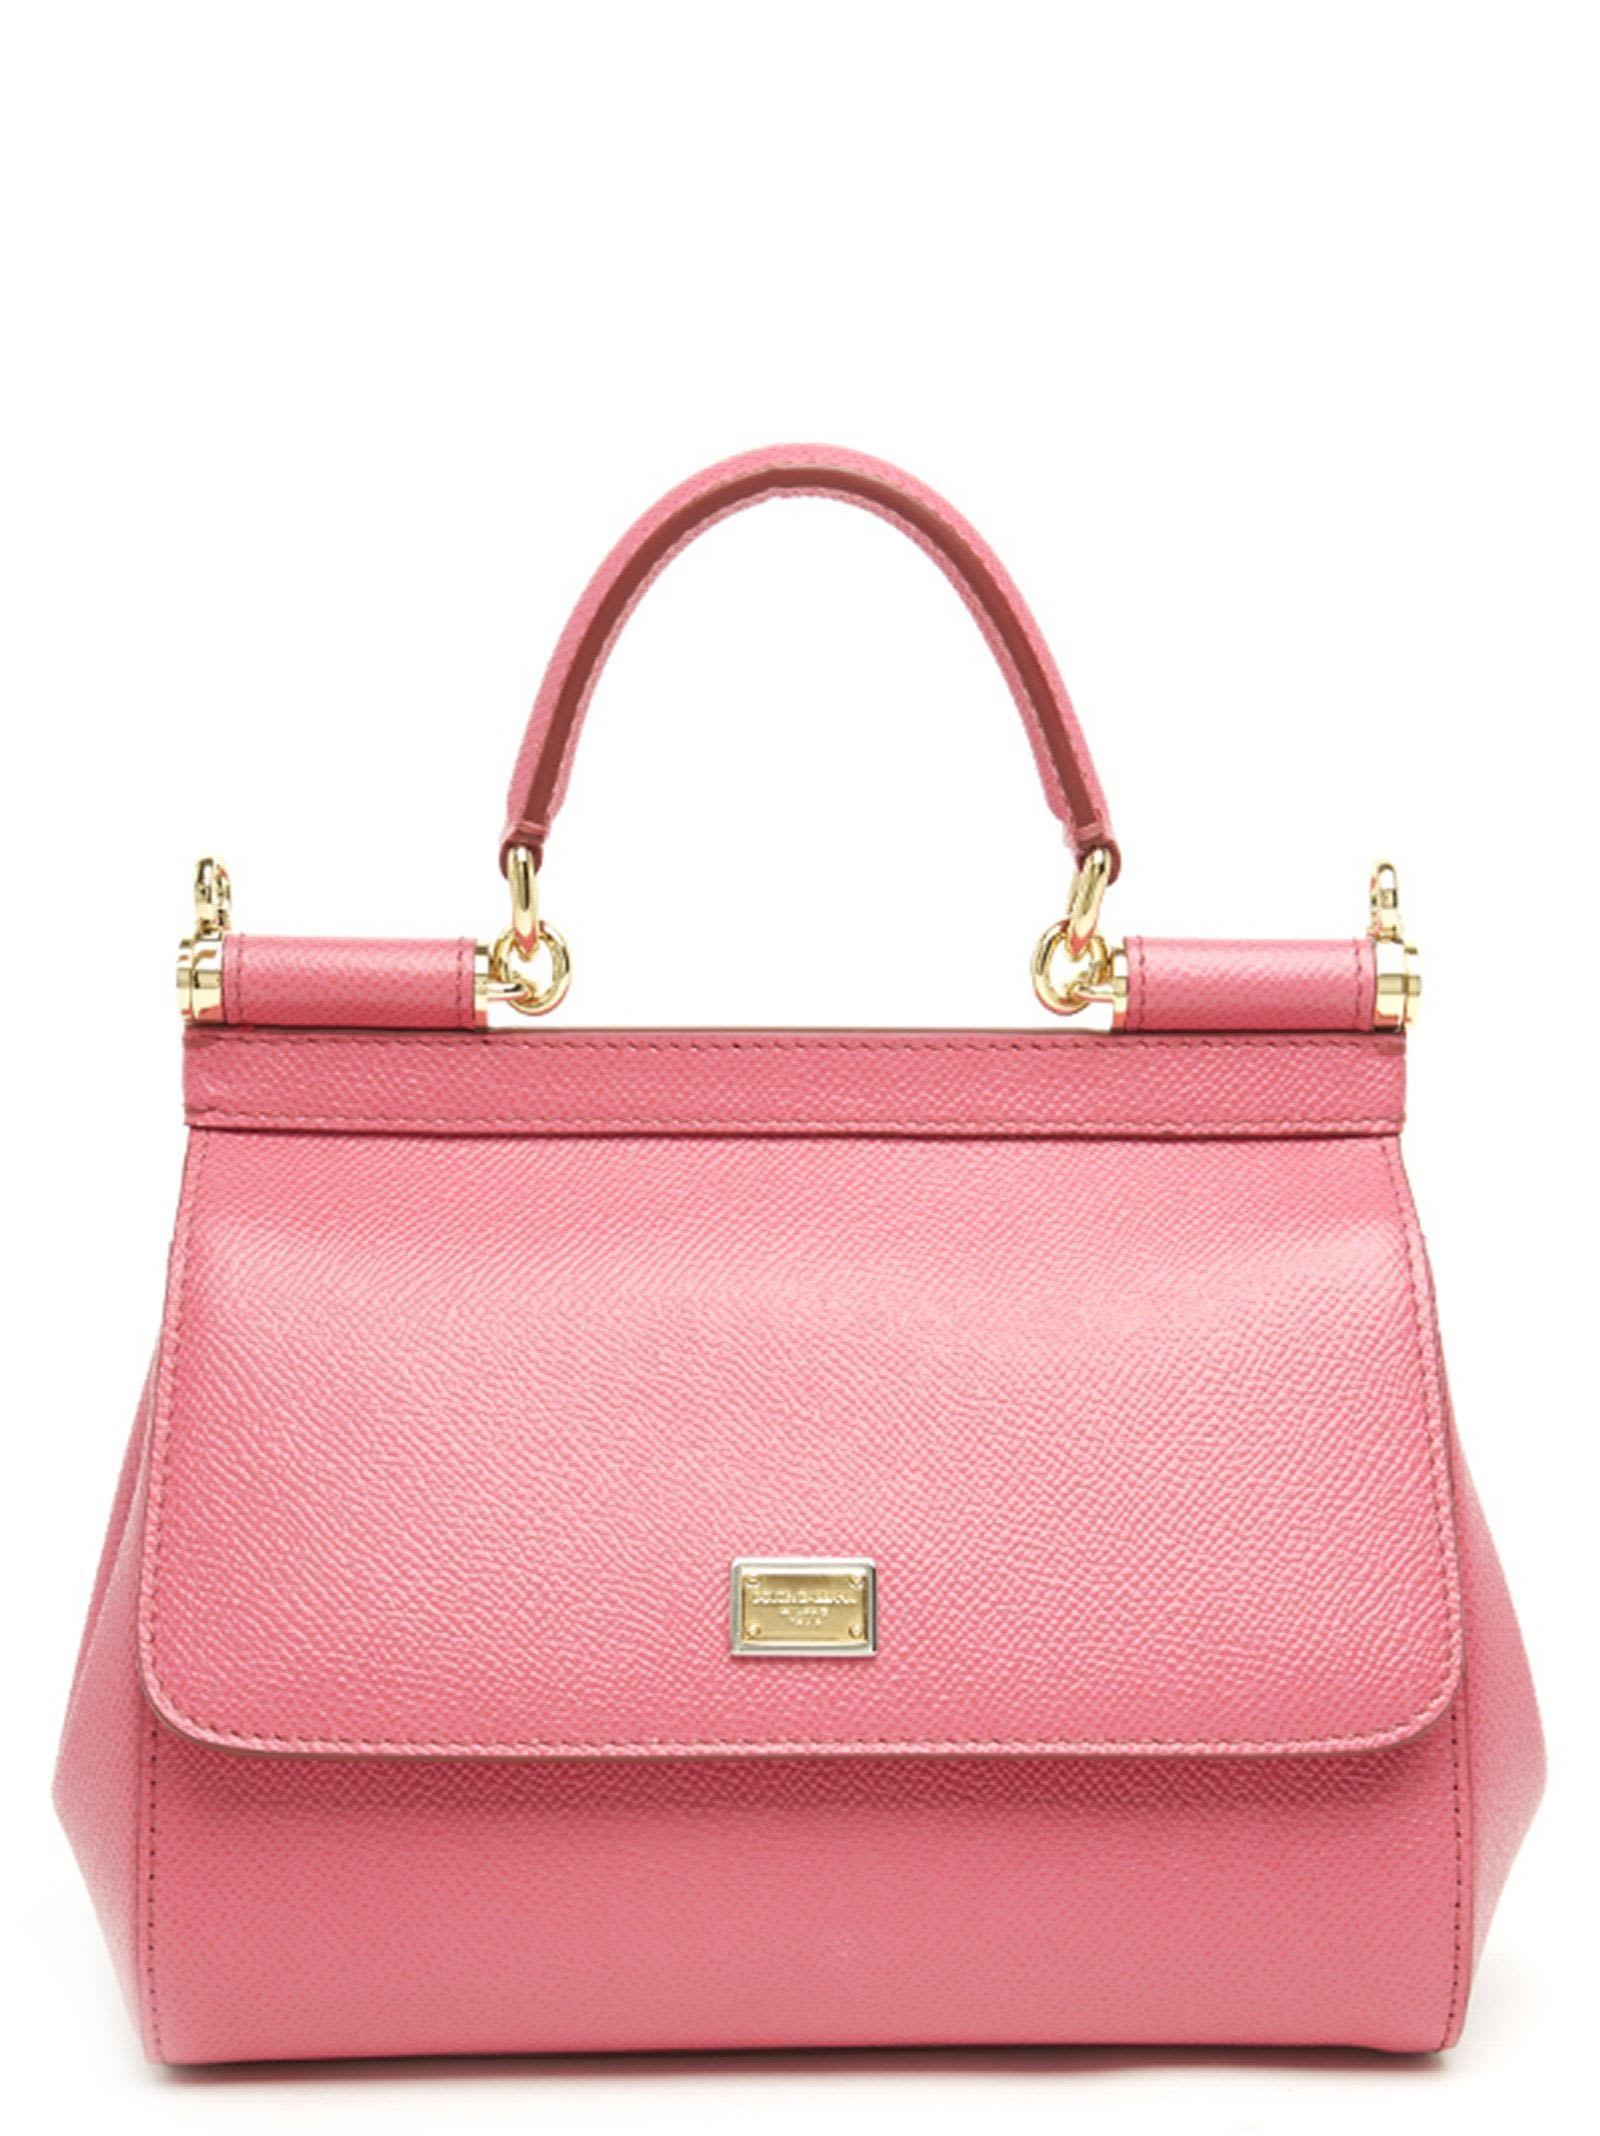 a4265c5c69 DOLCE   GABBANA BAG.  dolcegabbana  bags  leather